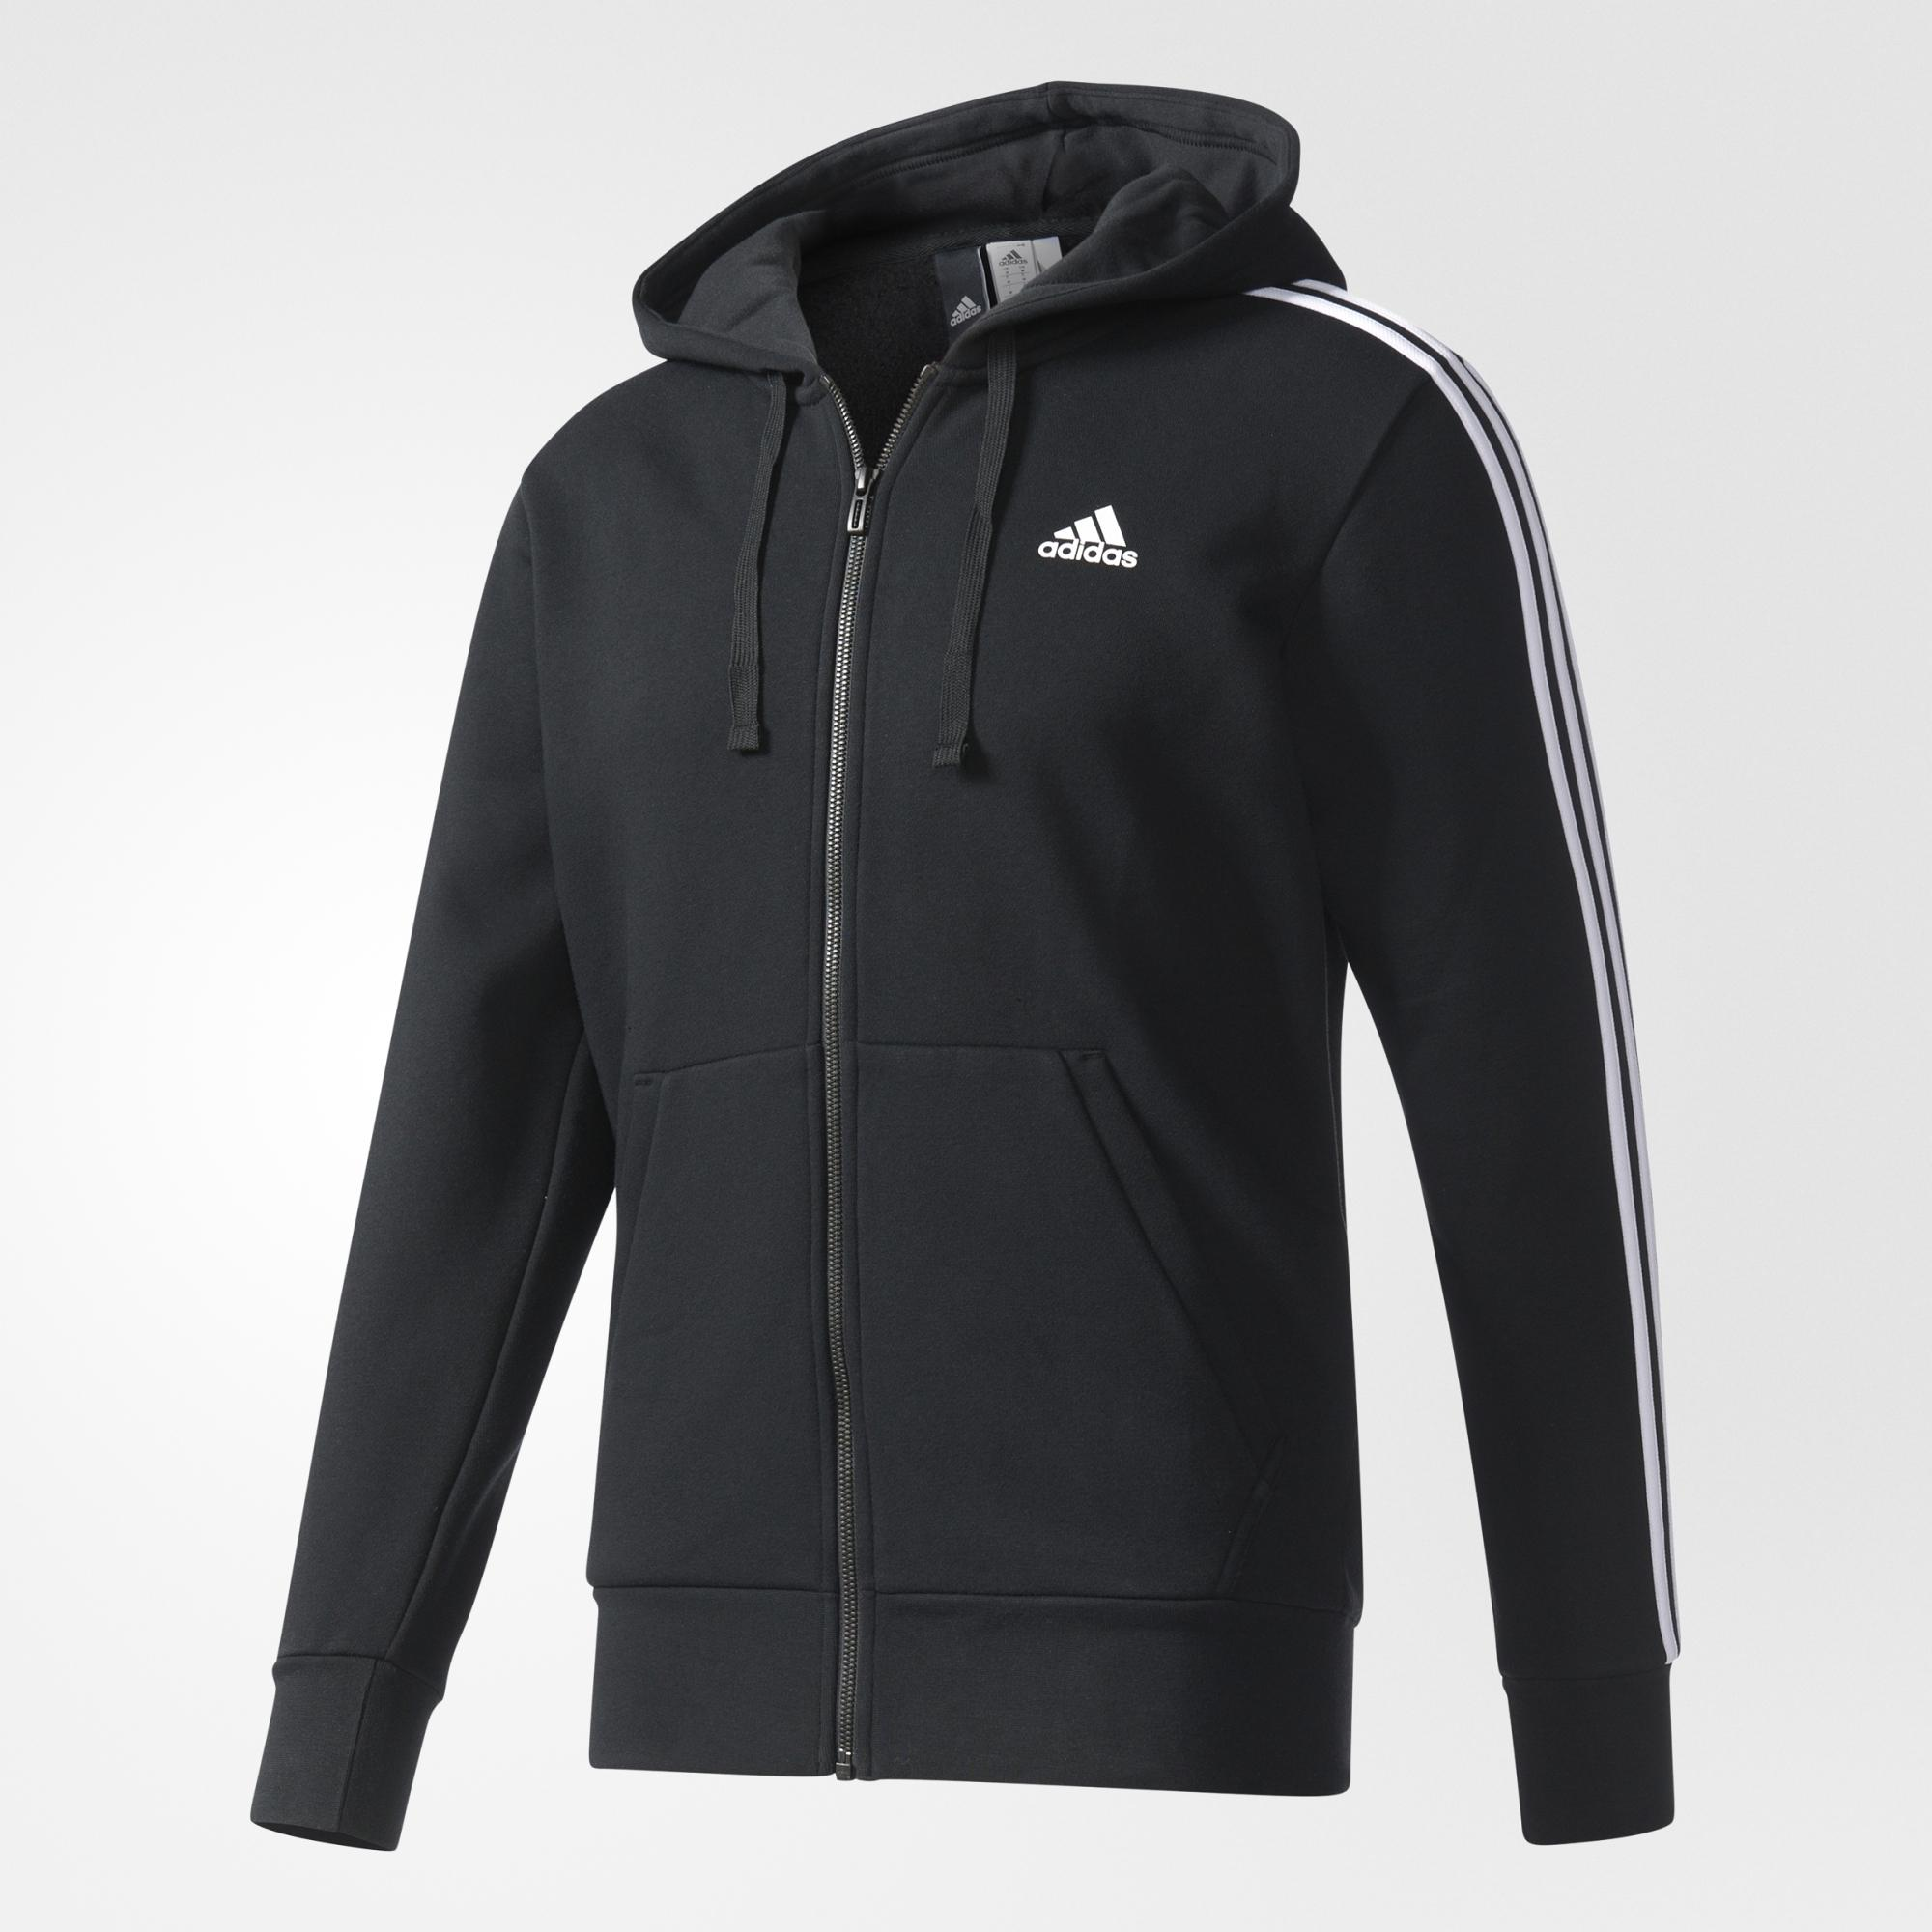 Adidas Jaket Hoodie Essentials 3 stripes Fleece - B47368 - hitam